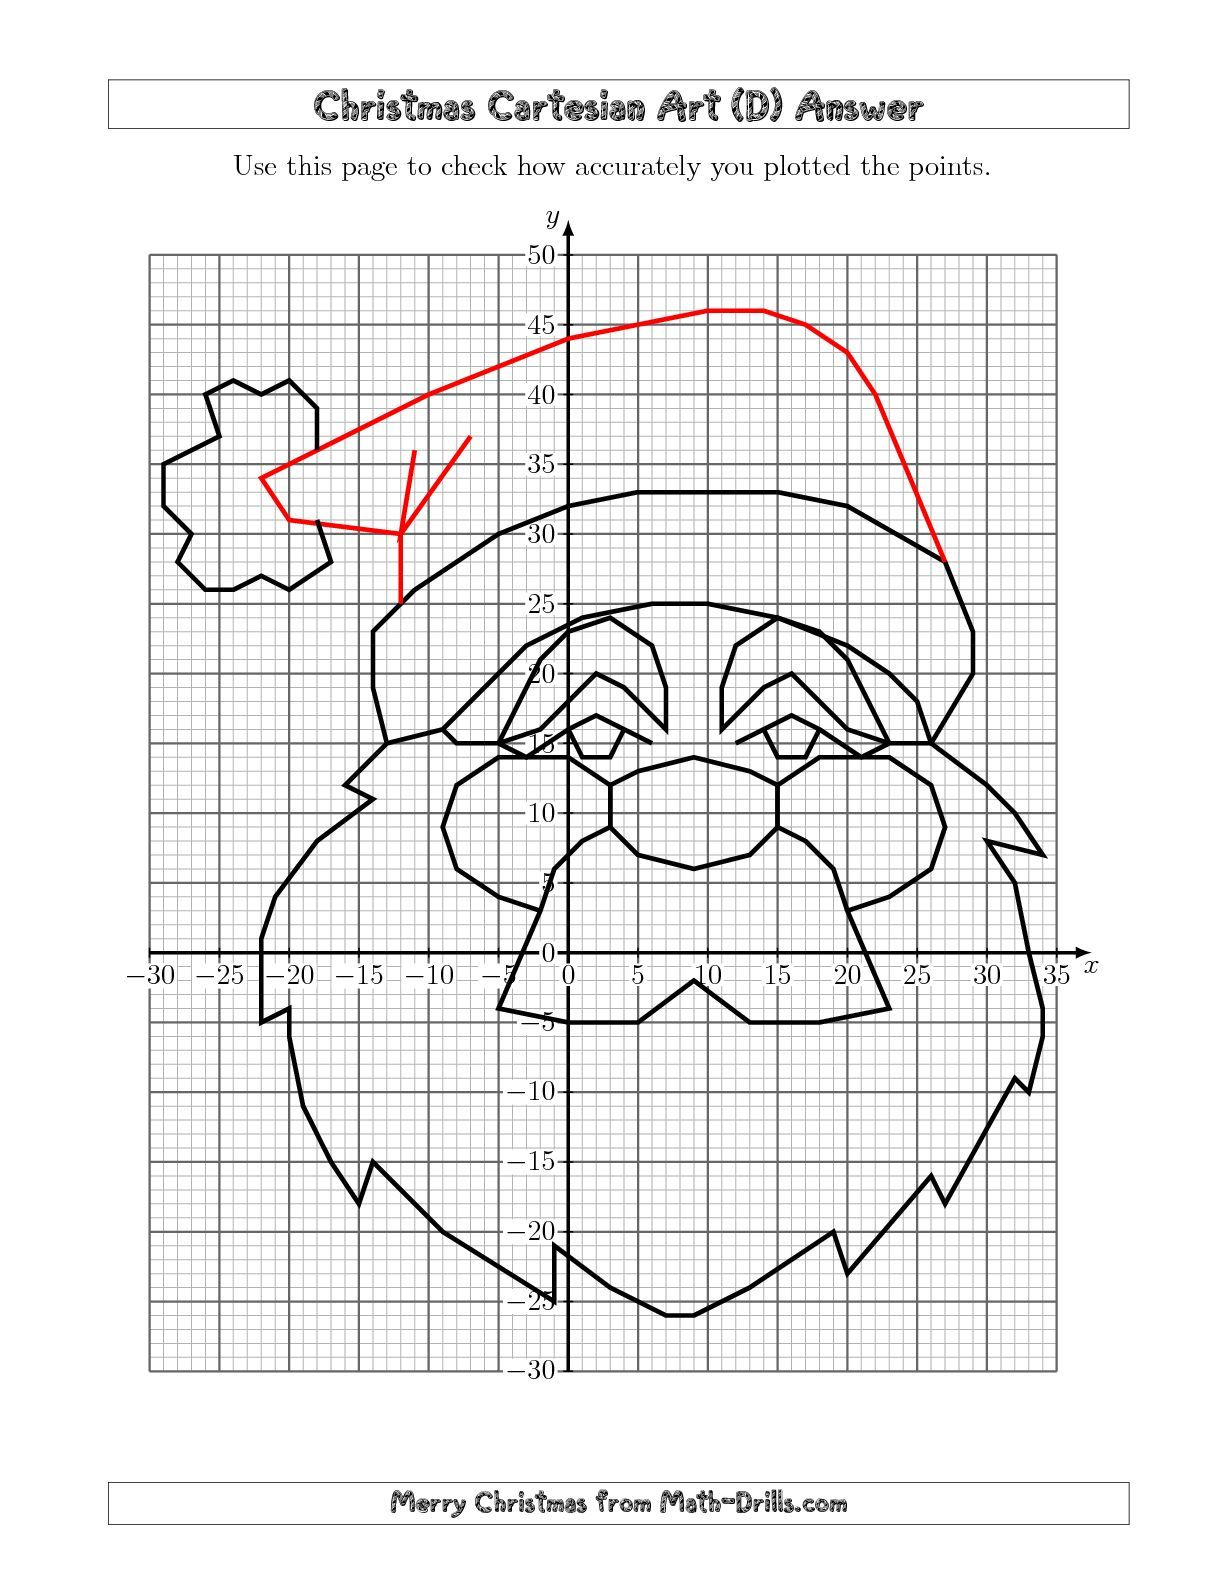 The Christmas Cartesian Art Santa (D) Math Worksheet From